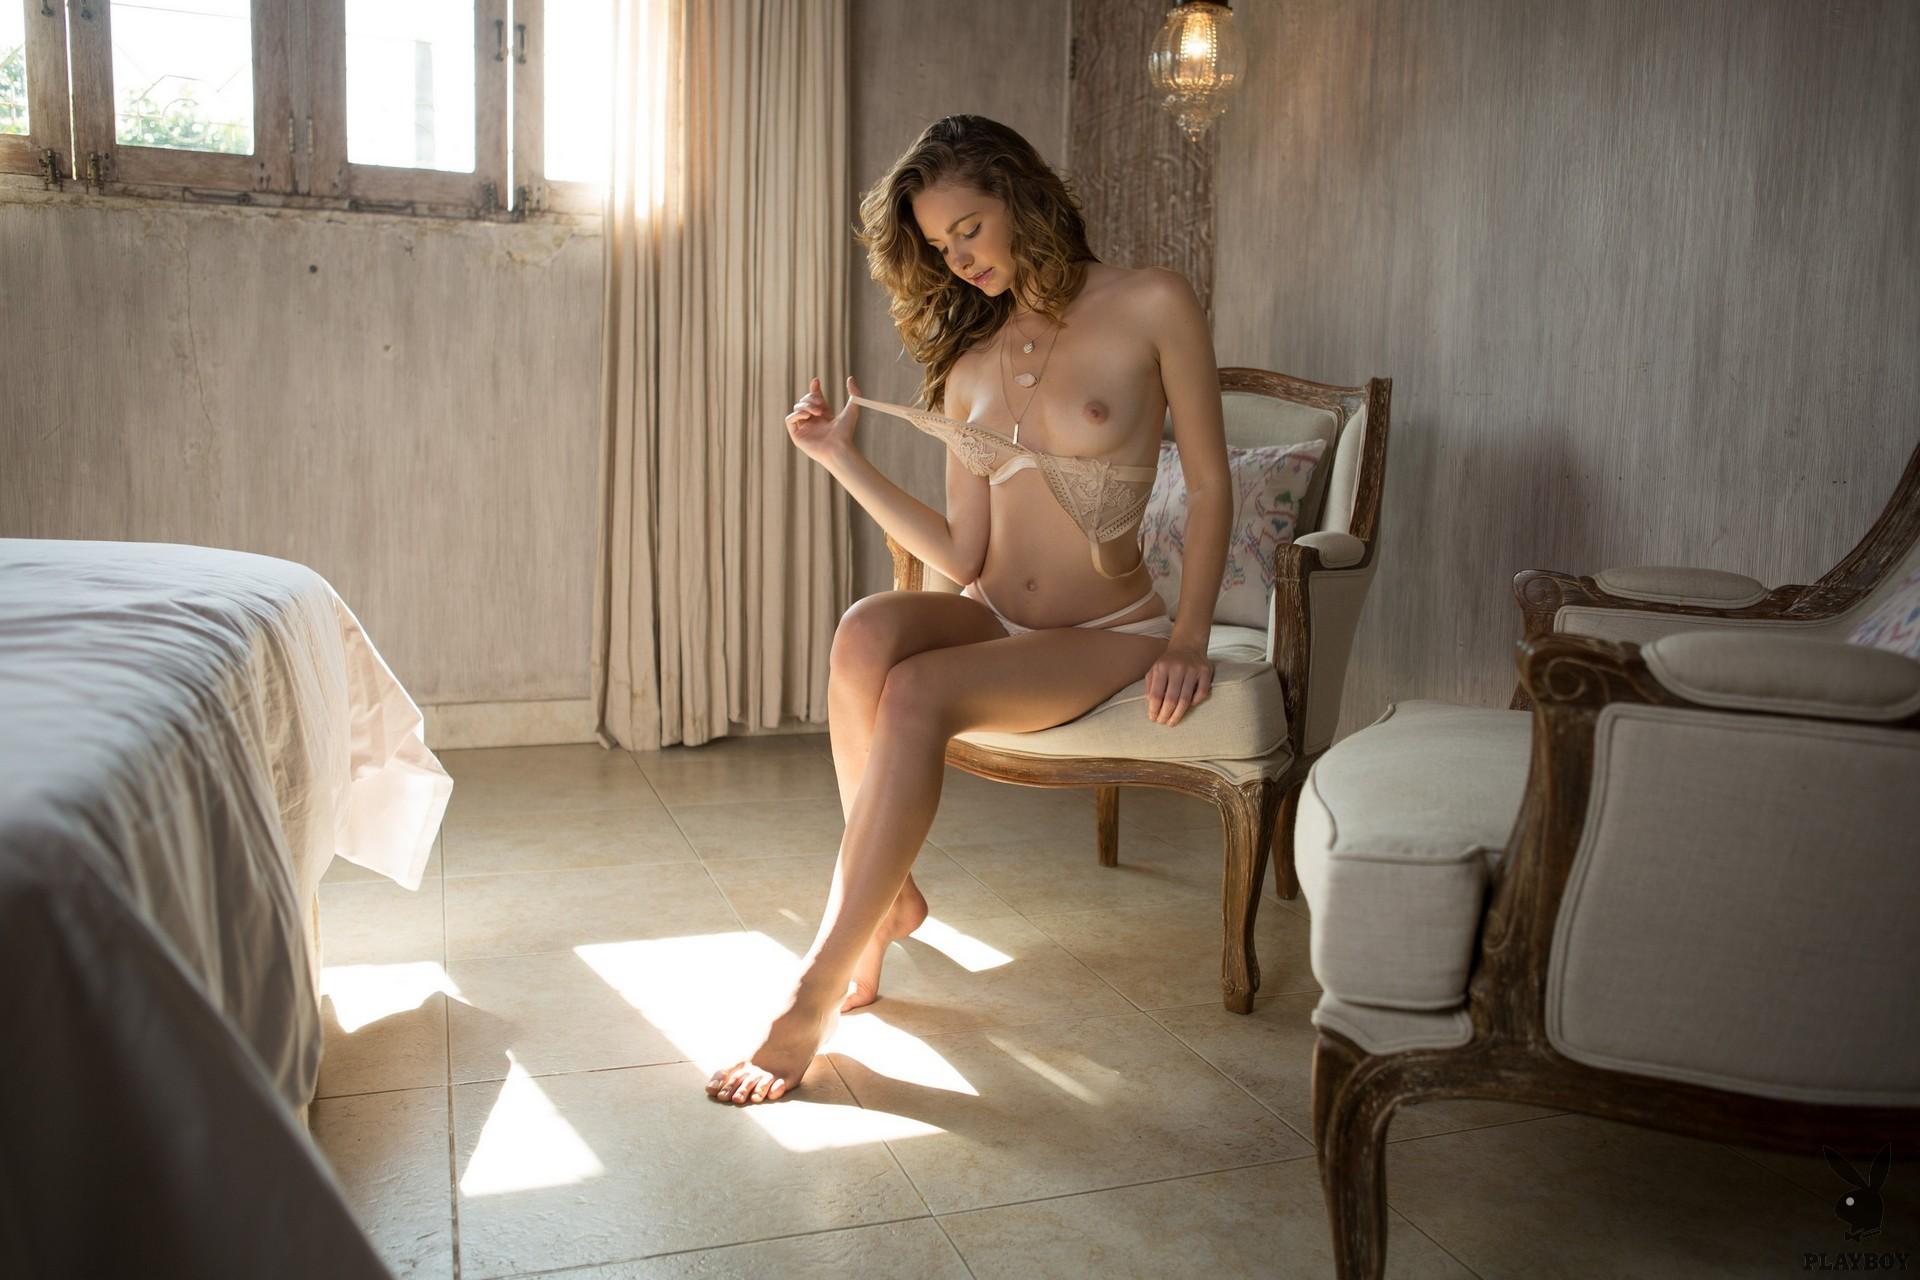 Mila Kunis American Psycho 2 - 2002 HD 720p